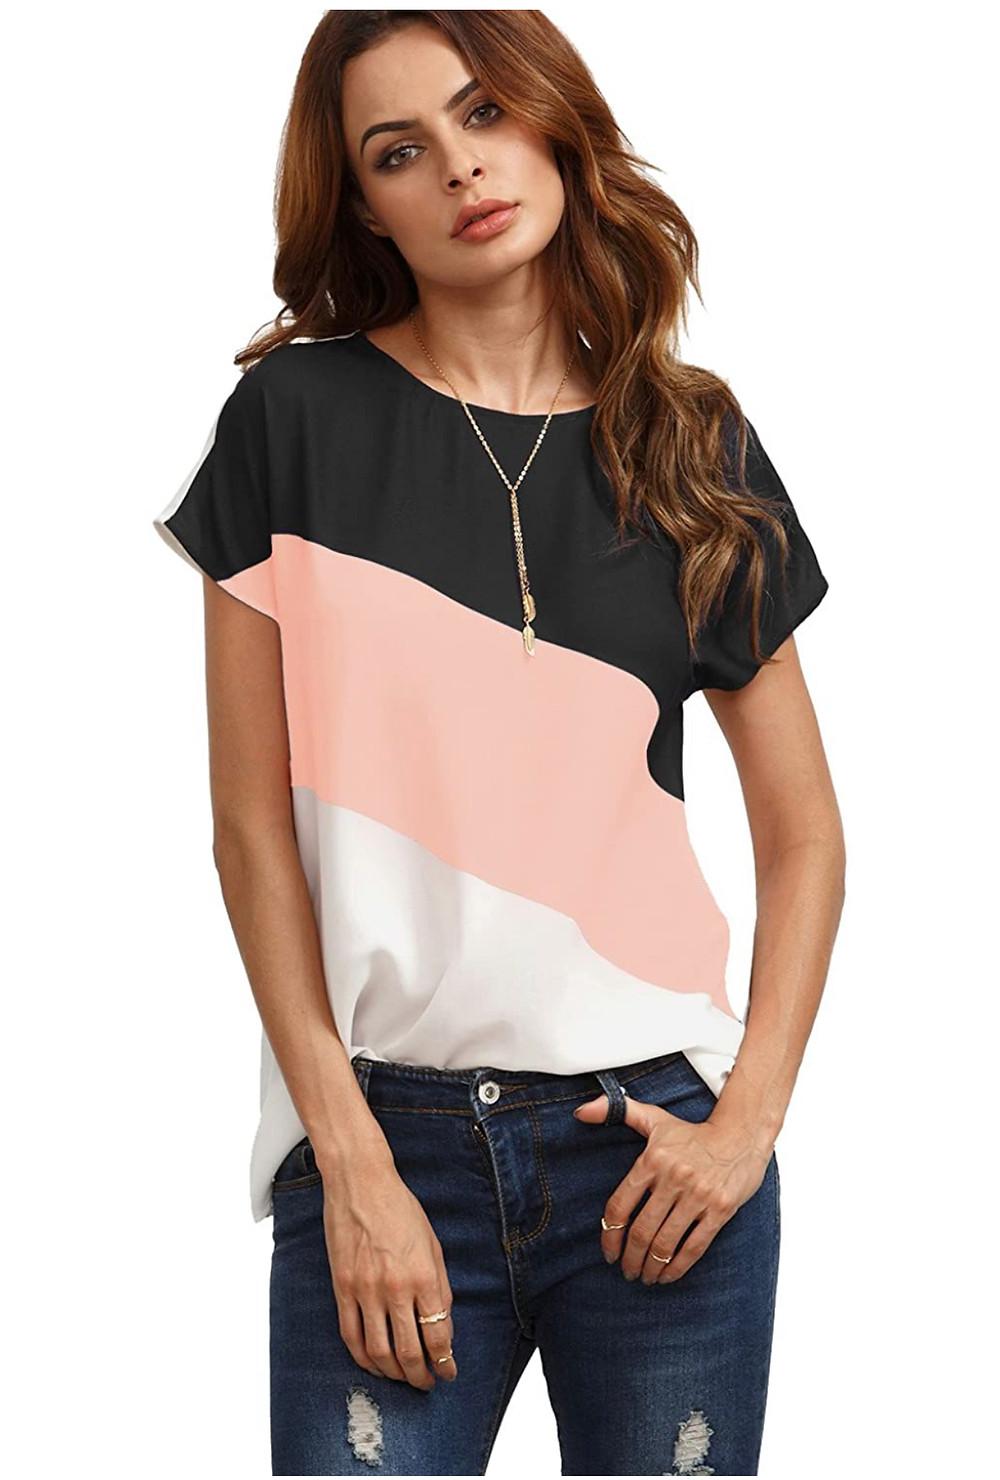 Women's Color Block Blouse Short Sleeve Tunic top